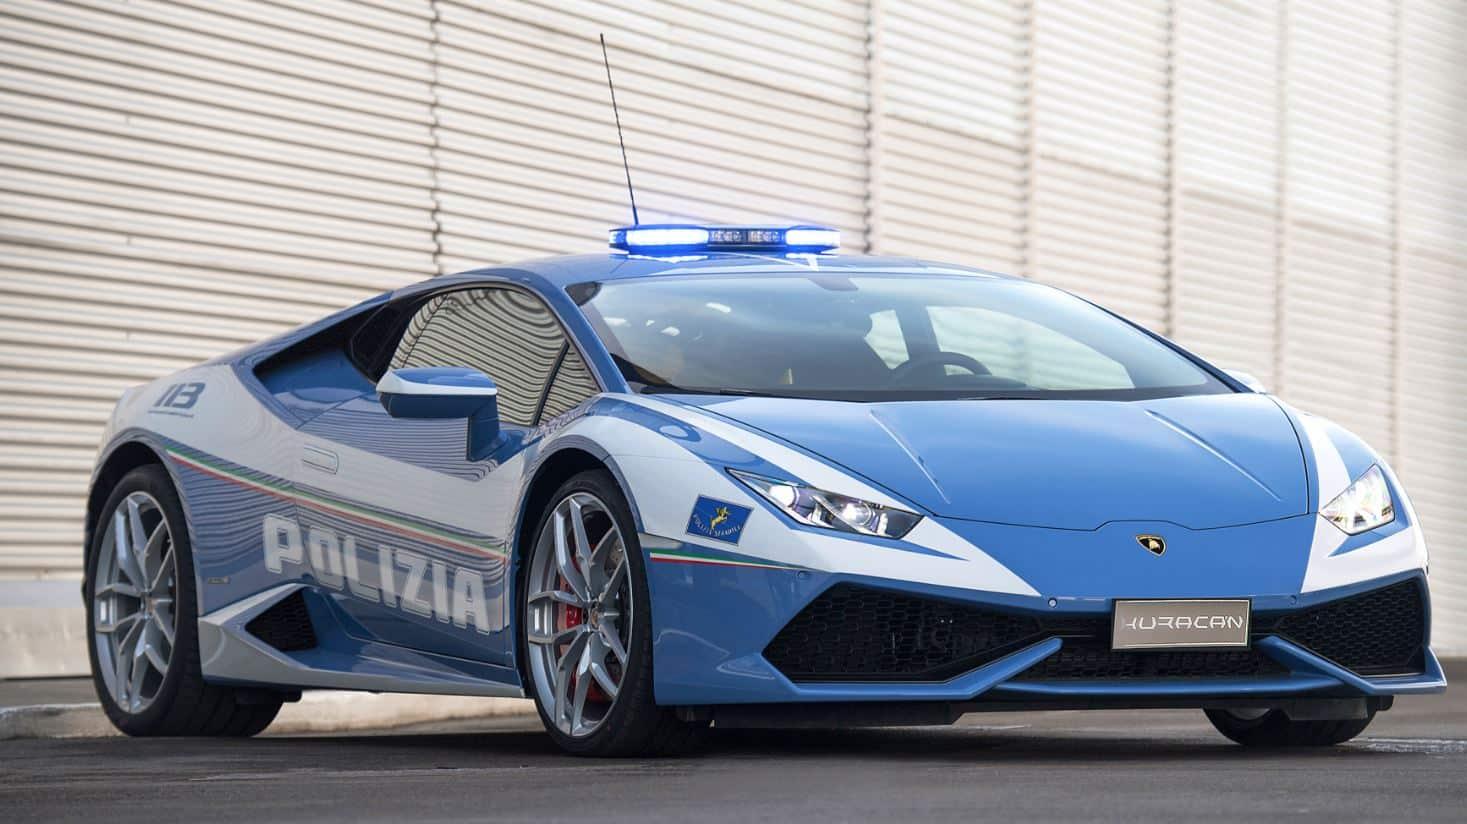 La policía italiana estrena nueva bestia: Otro Lamborghini Huracán…